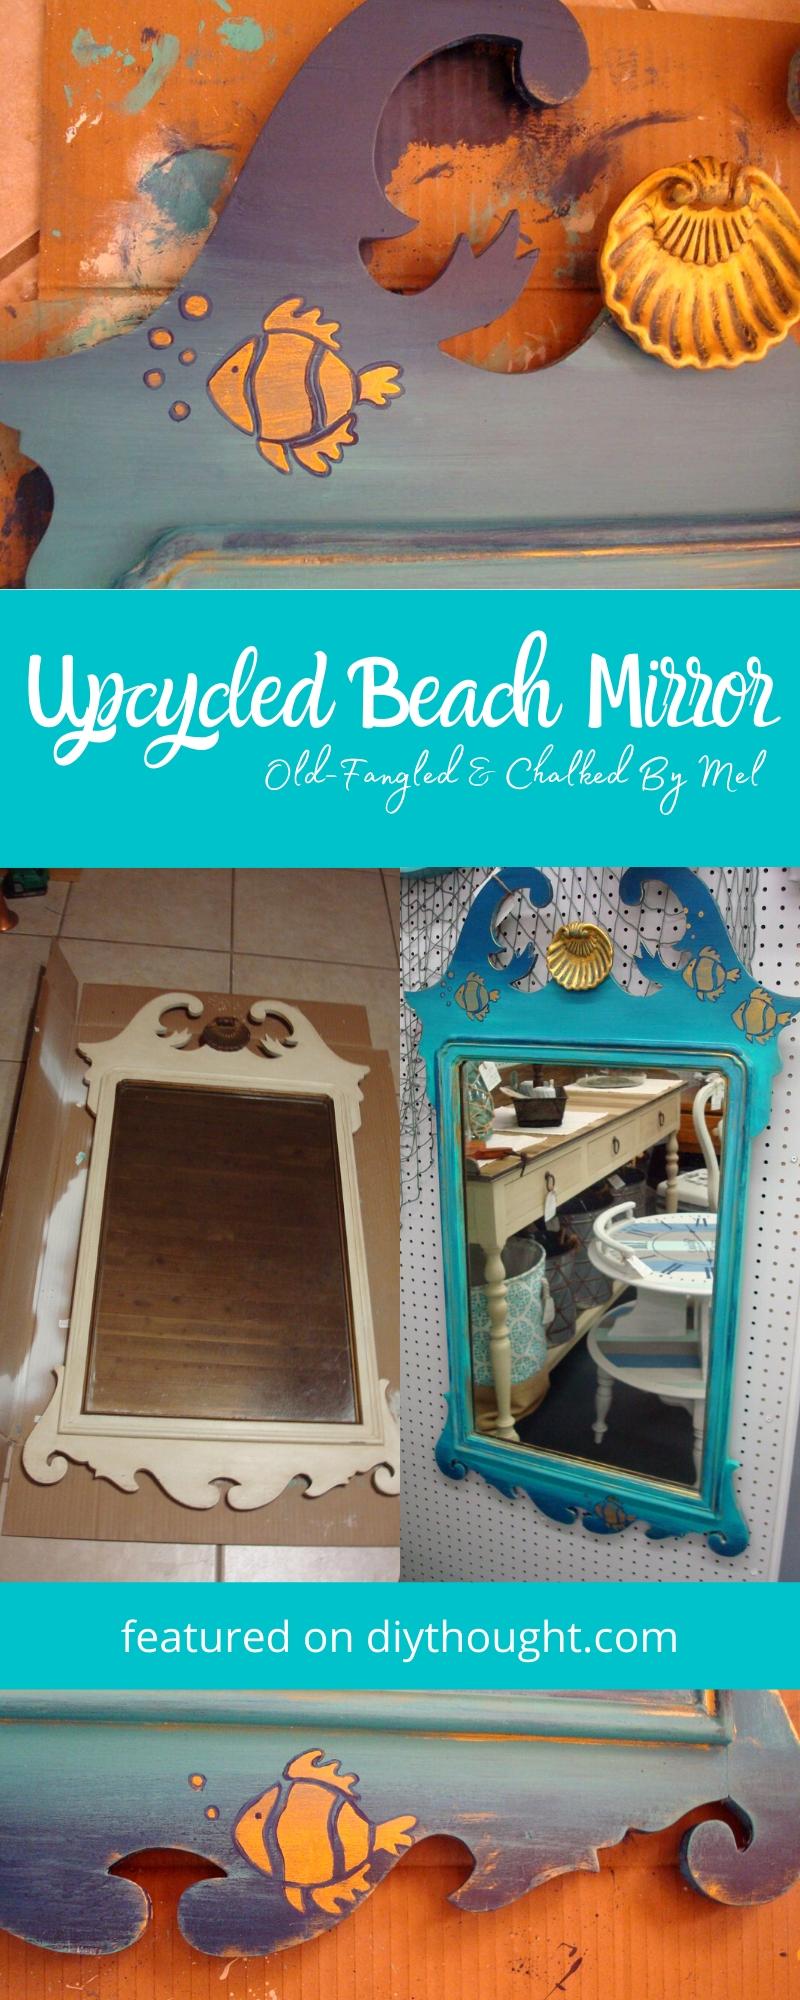 upcycled beach mirror DIY